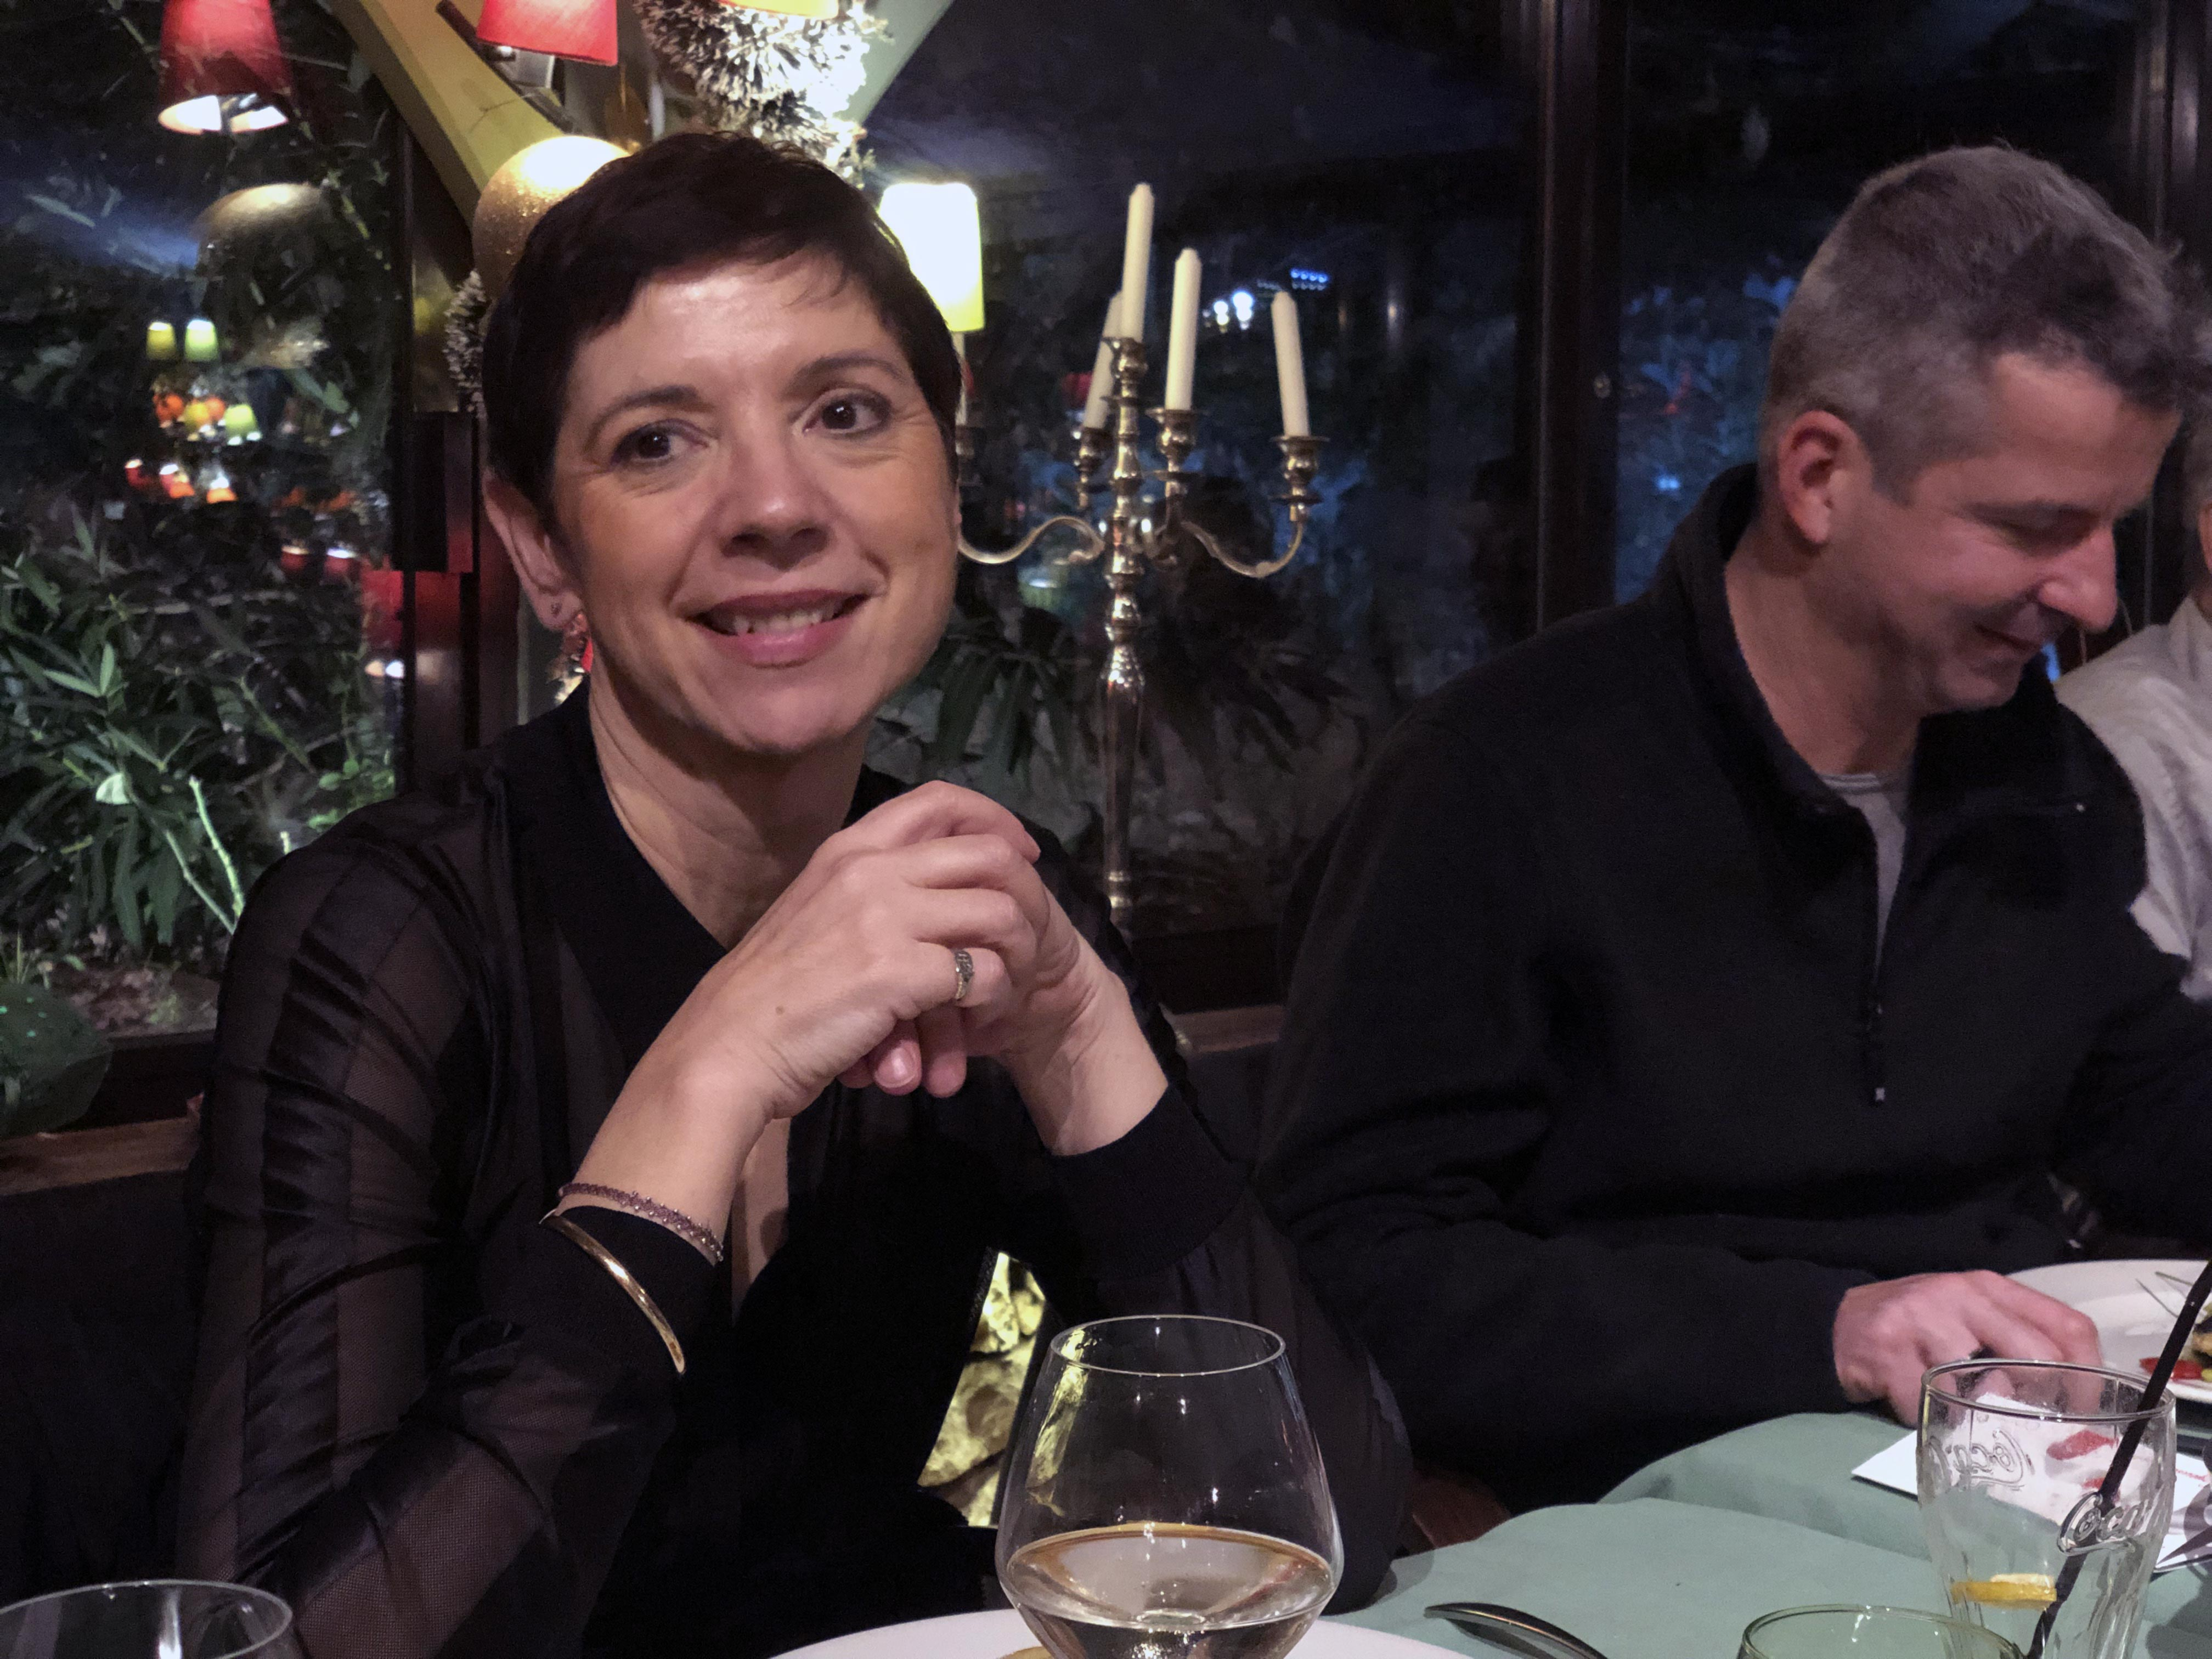 Repas-de-fin-d'année-nice-marseille-paris-aucop-noel-audiovisuel-event-evenement-evenementiel-communication-equipe-team